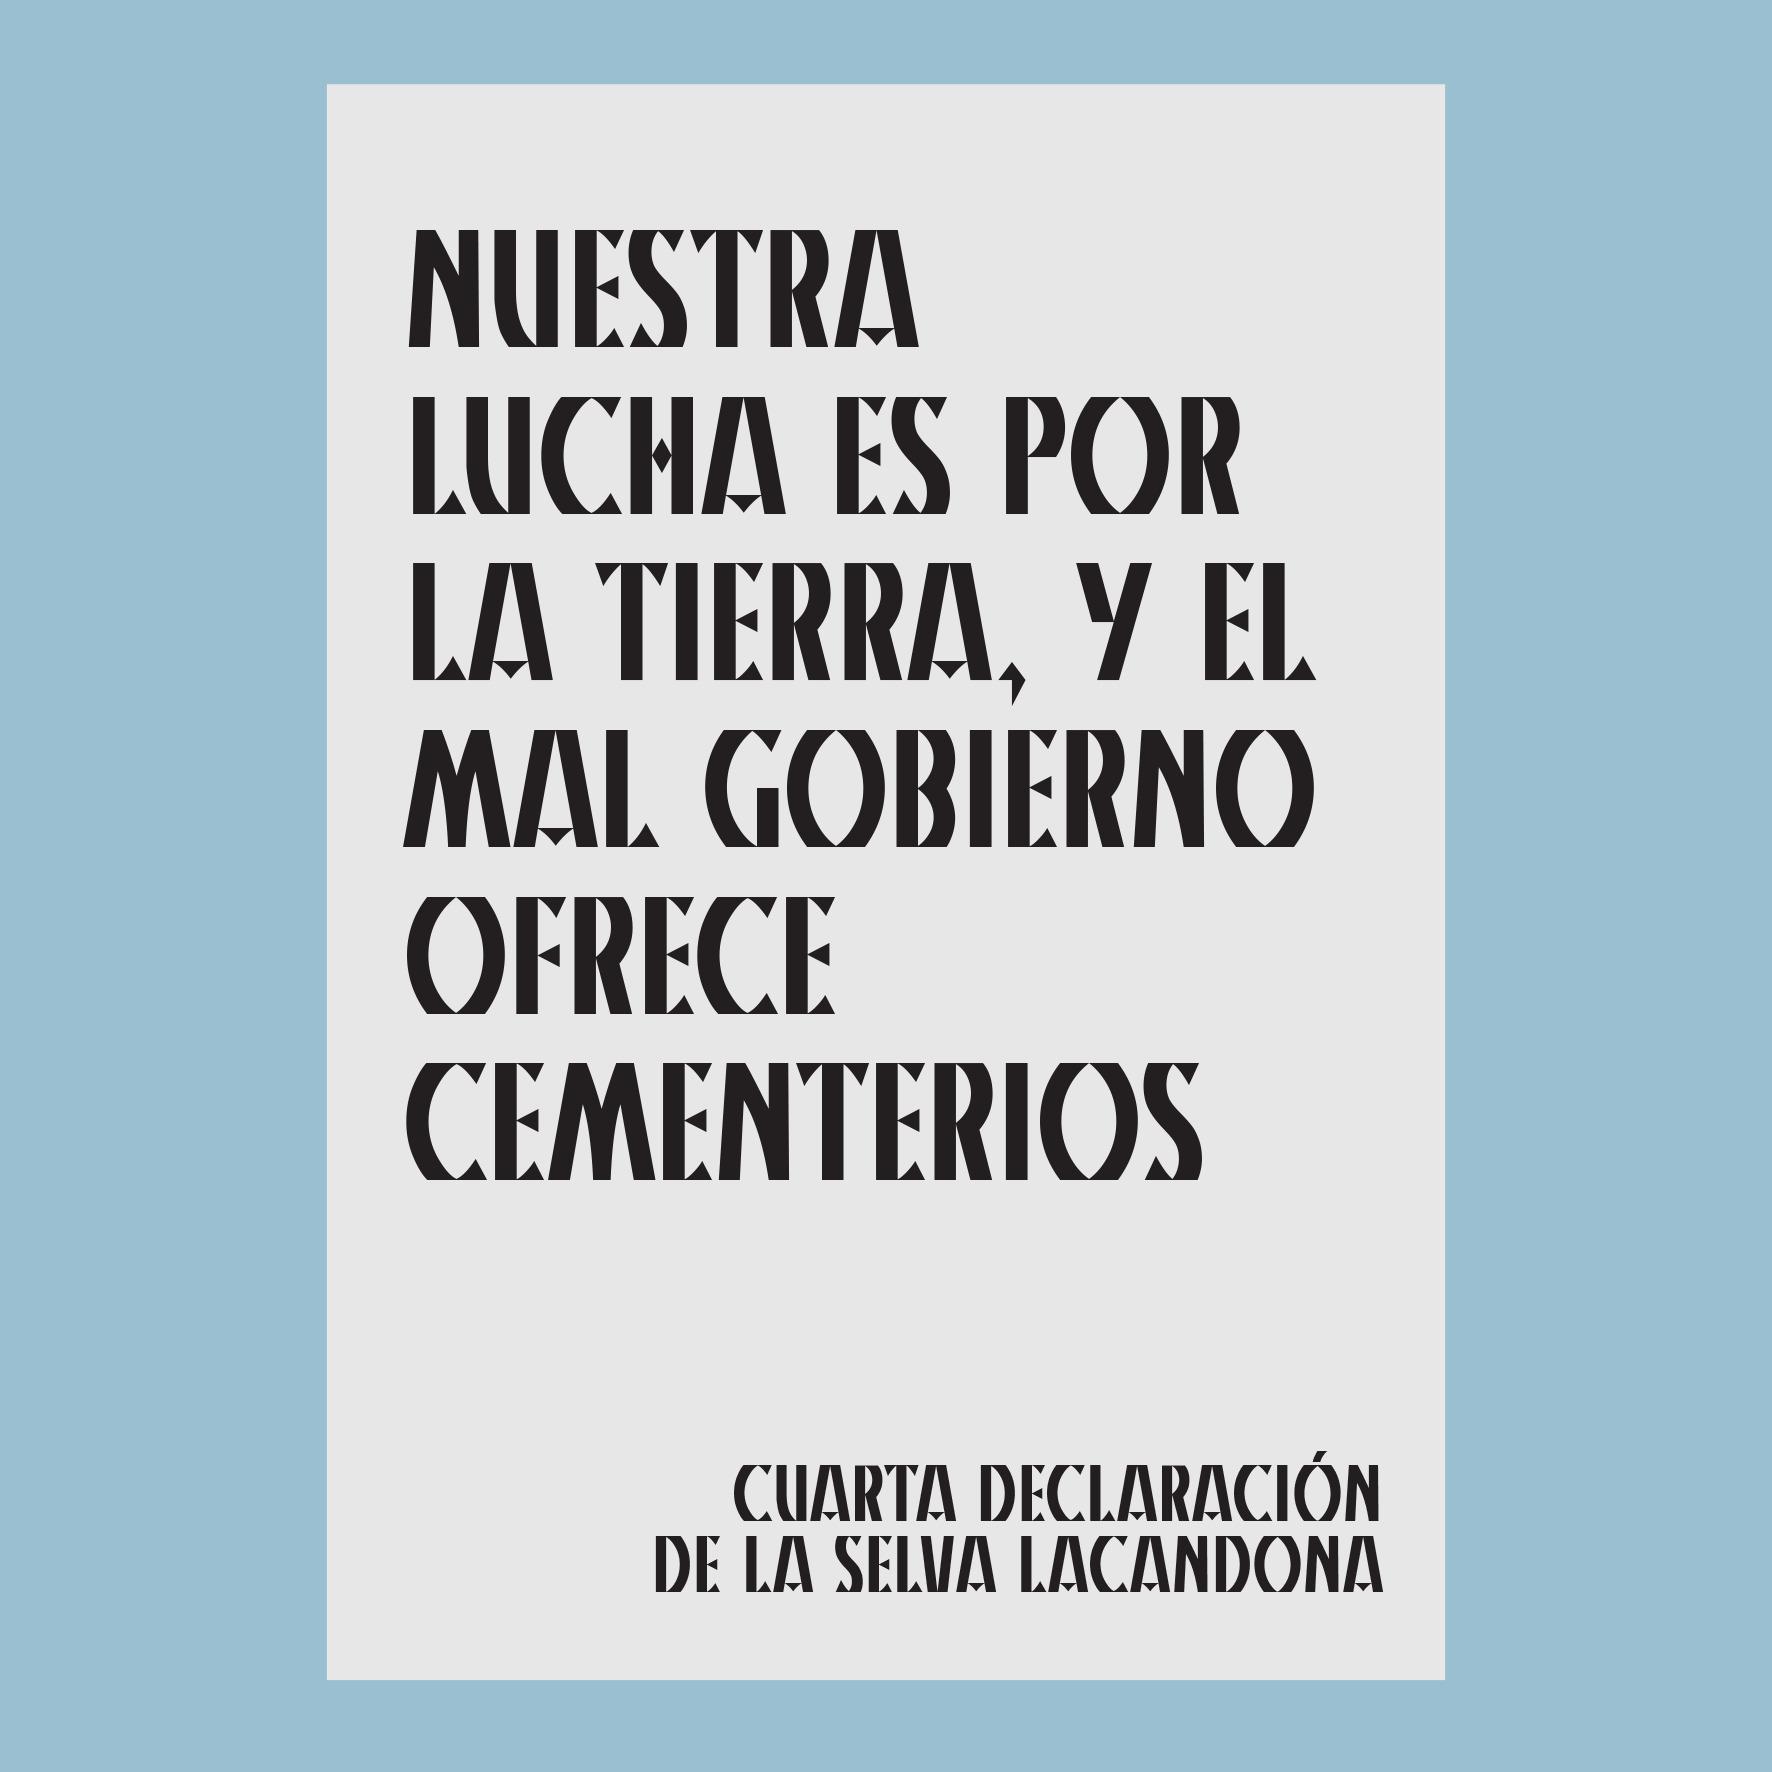 midia-azul-4- espanhol